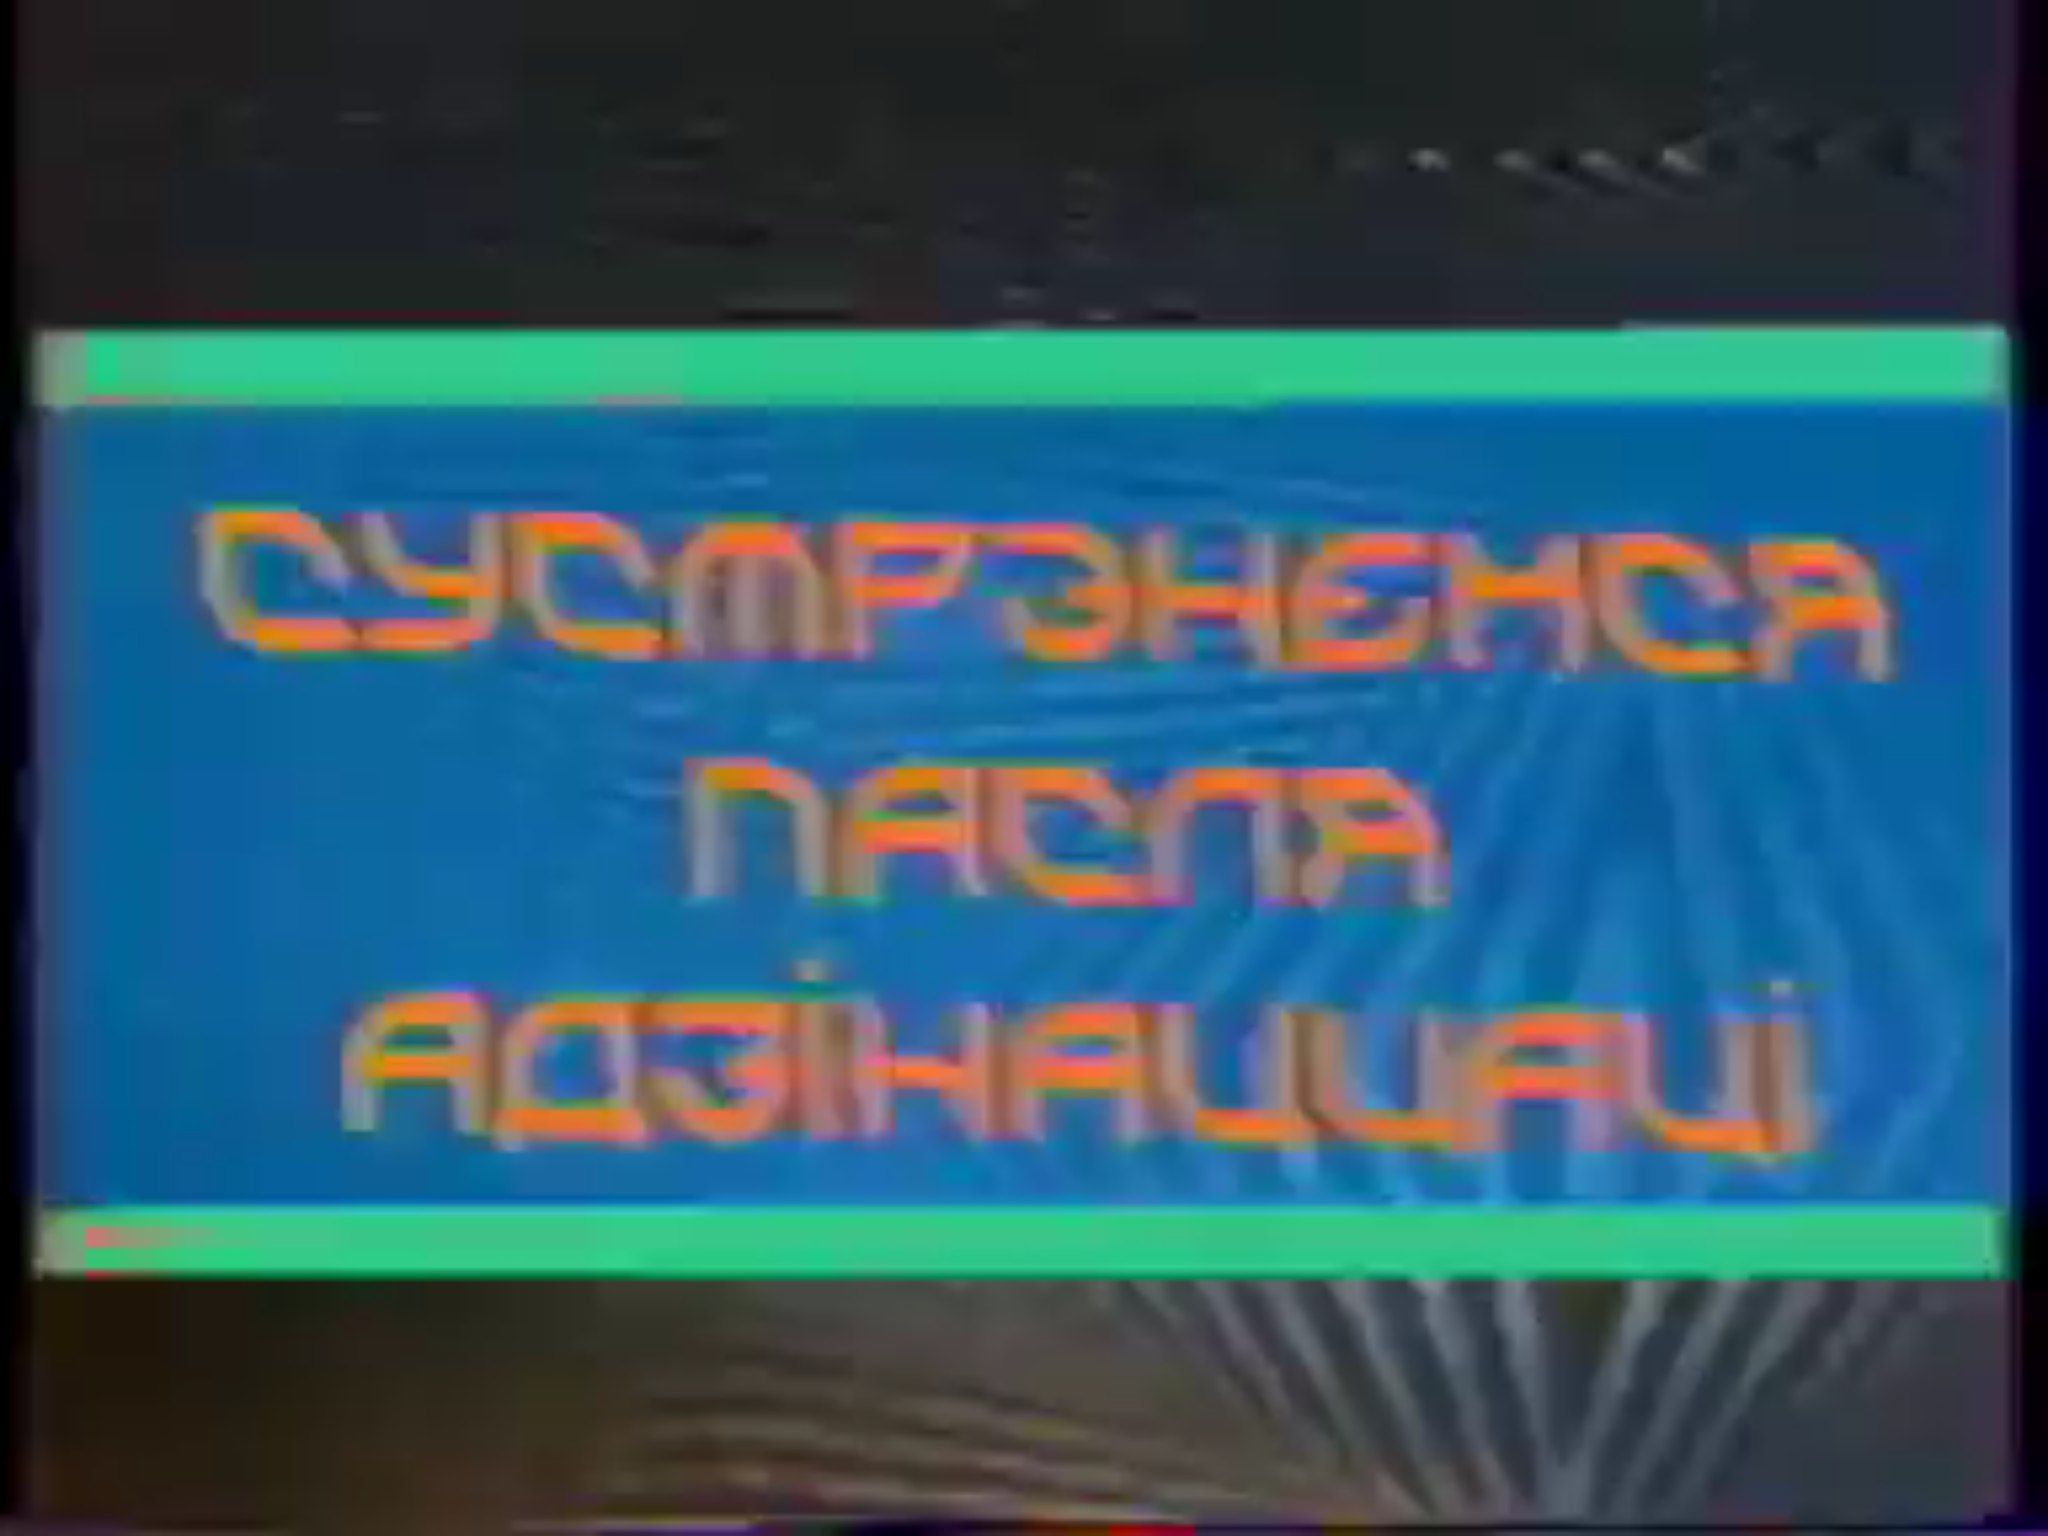 Встретимся после одиннадцати (Белорусская программ ЦТ СССР, 1982)...